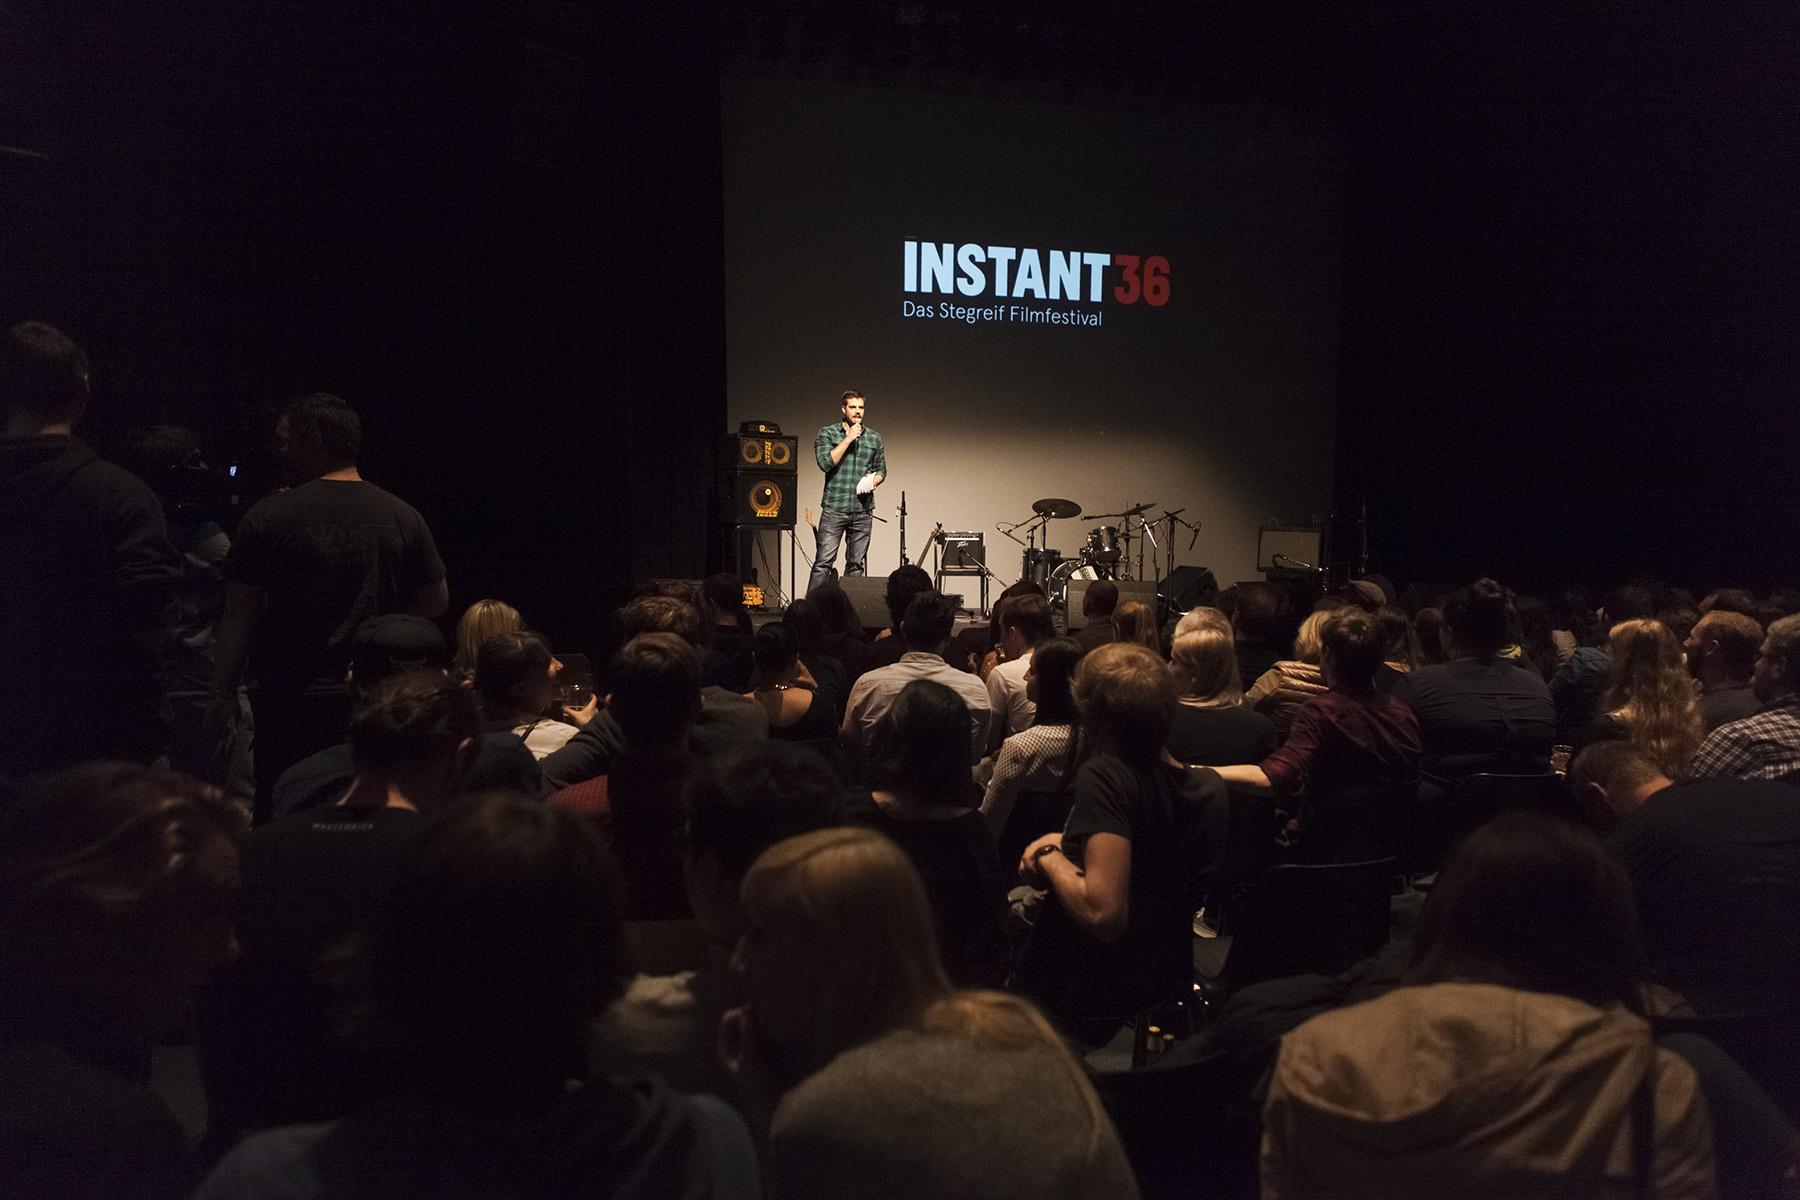 INSTANT36 Screening